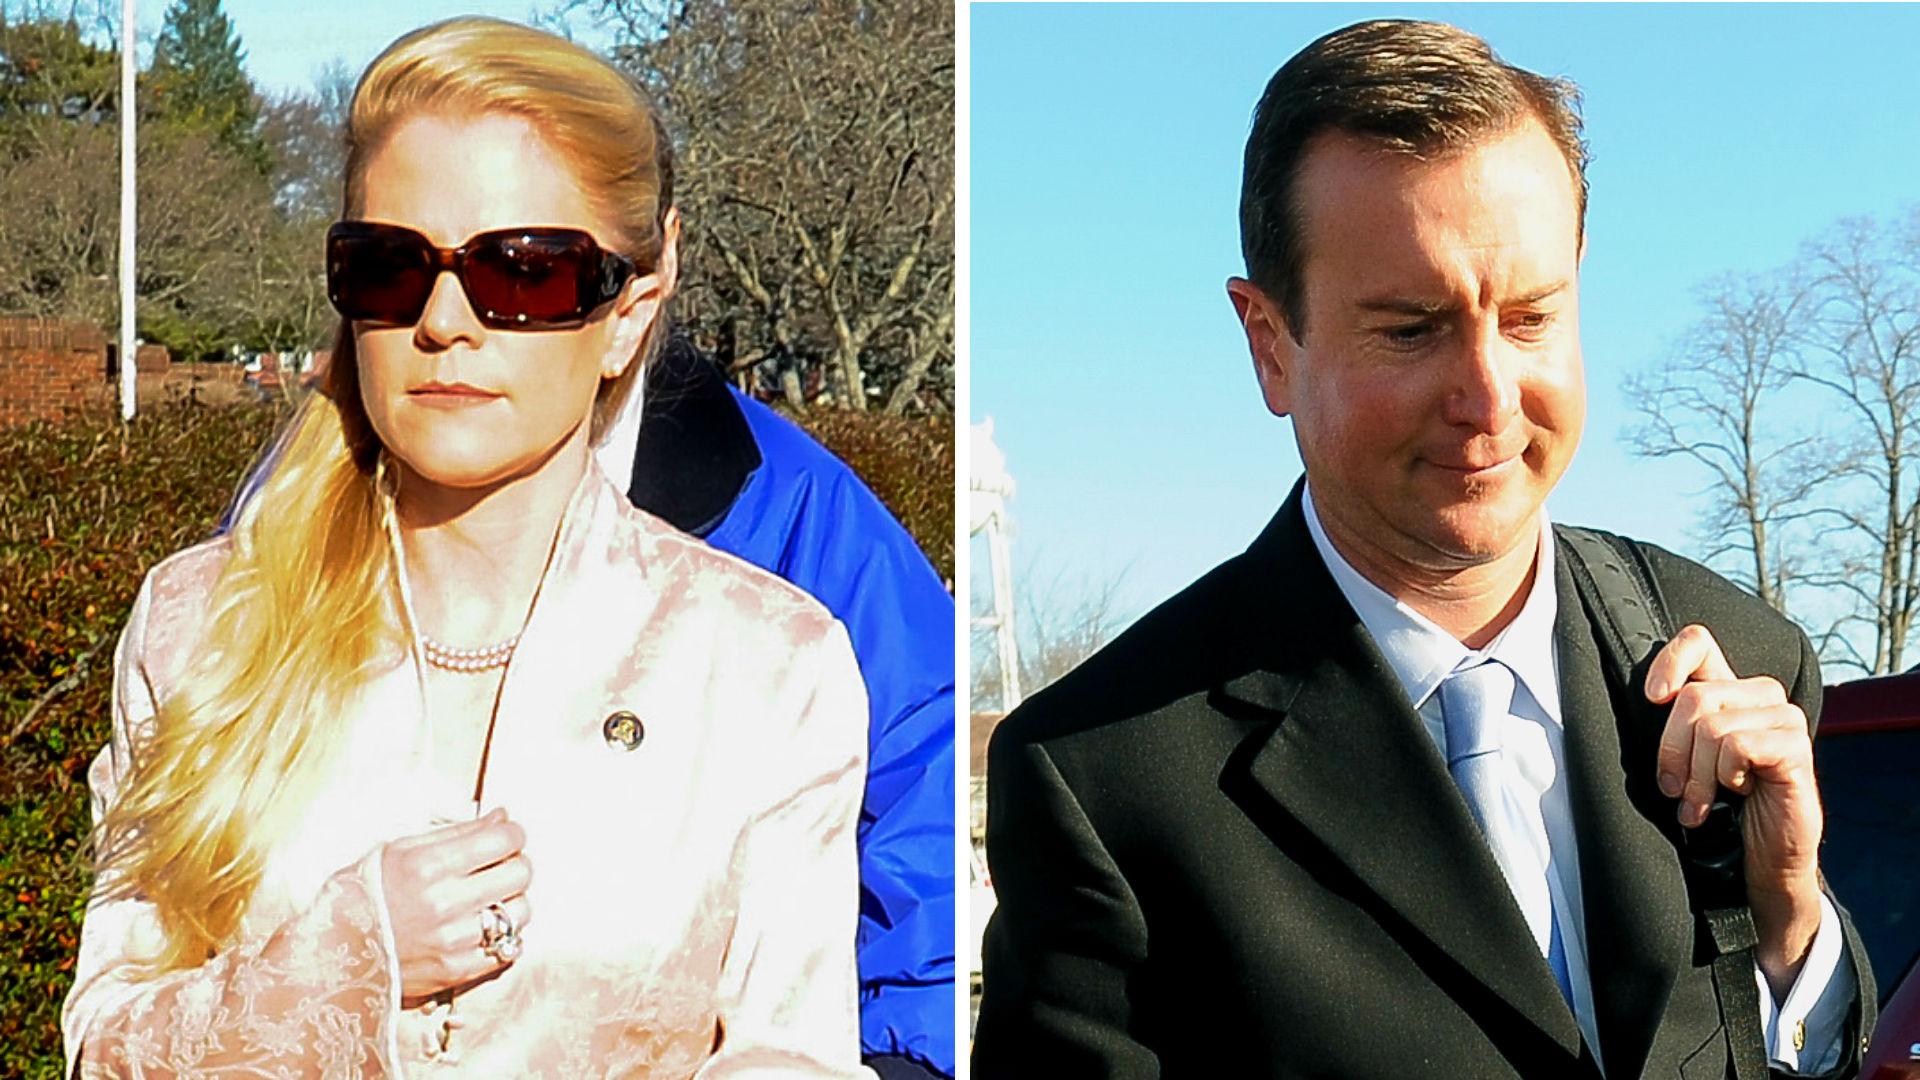 Report reveals disturbing details about Patricia Driscoll, Kurt Busch relationship